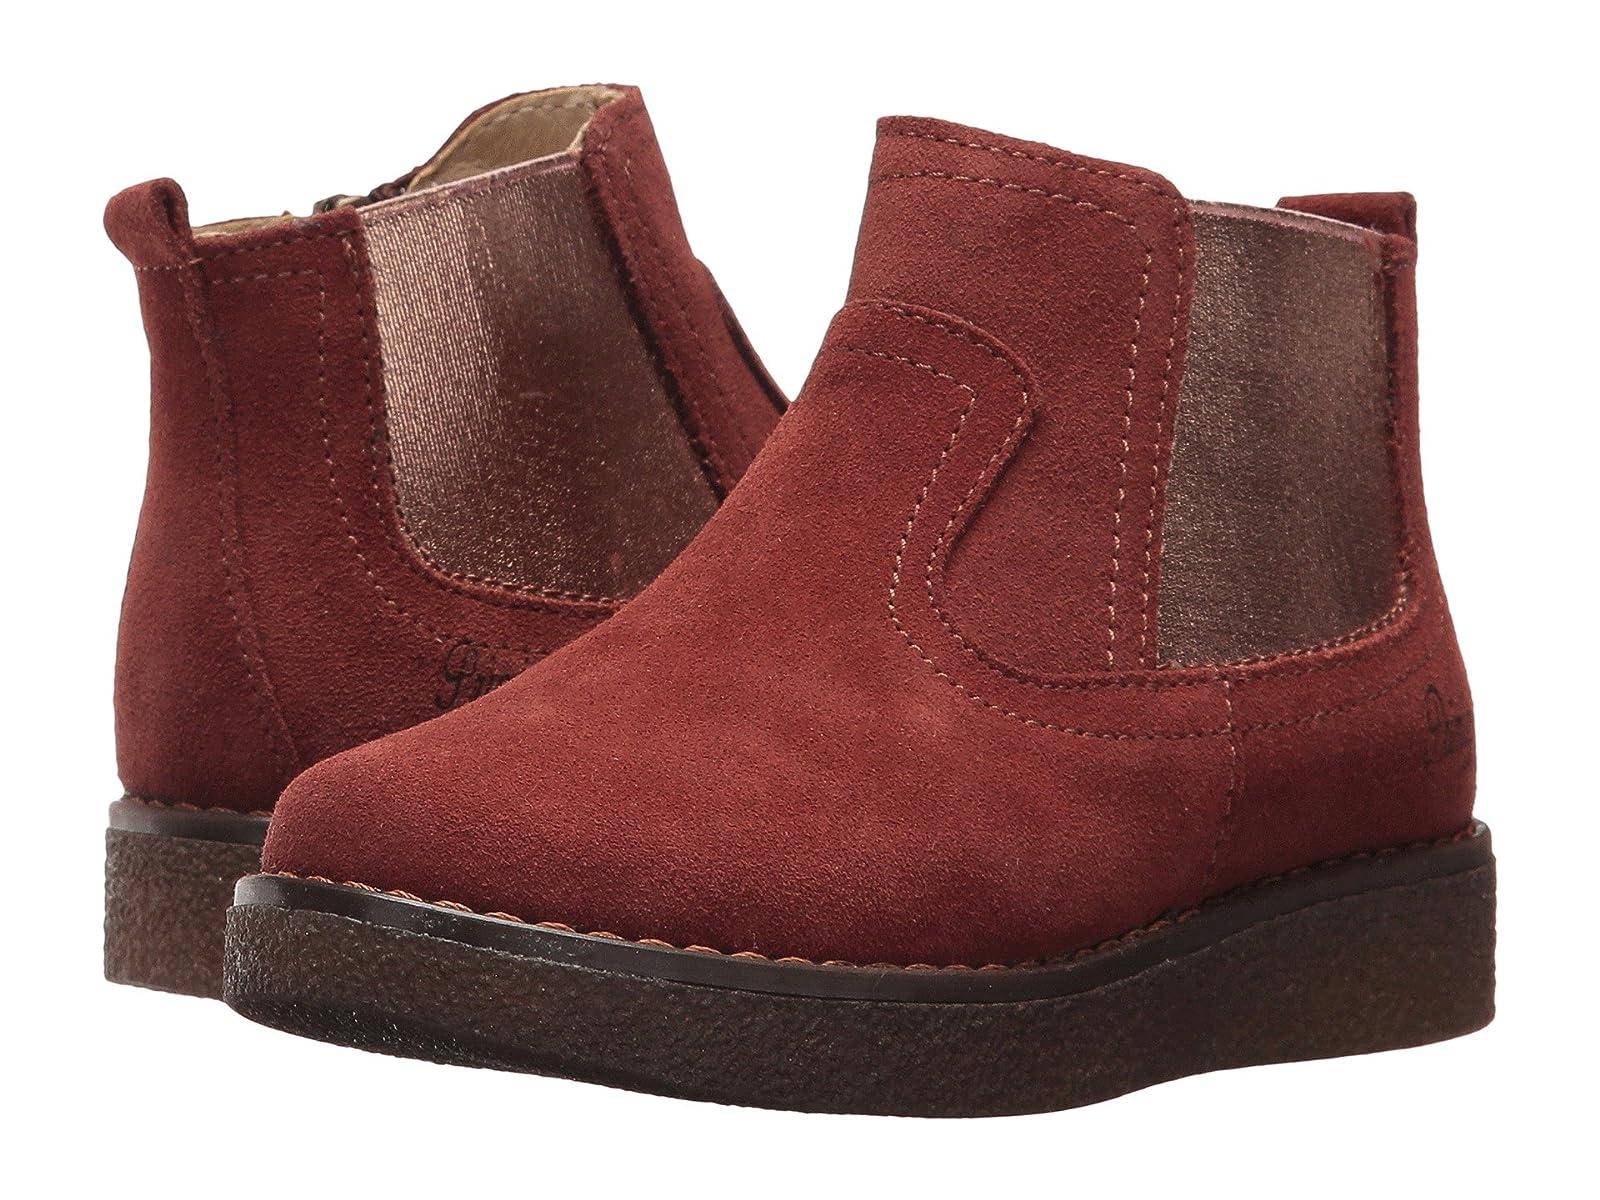 Primigi Kids PWC 8162 (Toddler/Little Kid)Cheap and distinctive eye-catching shoes